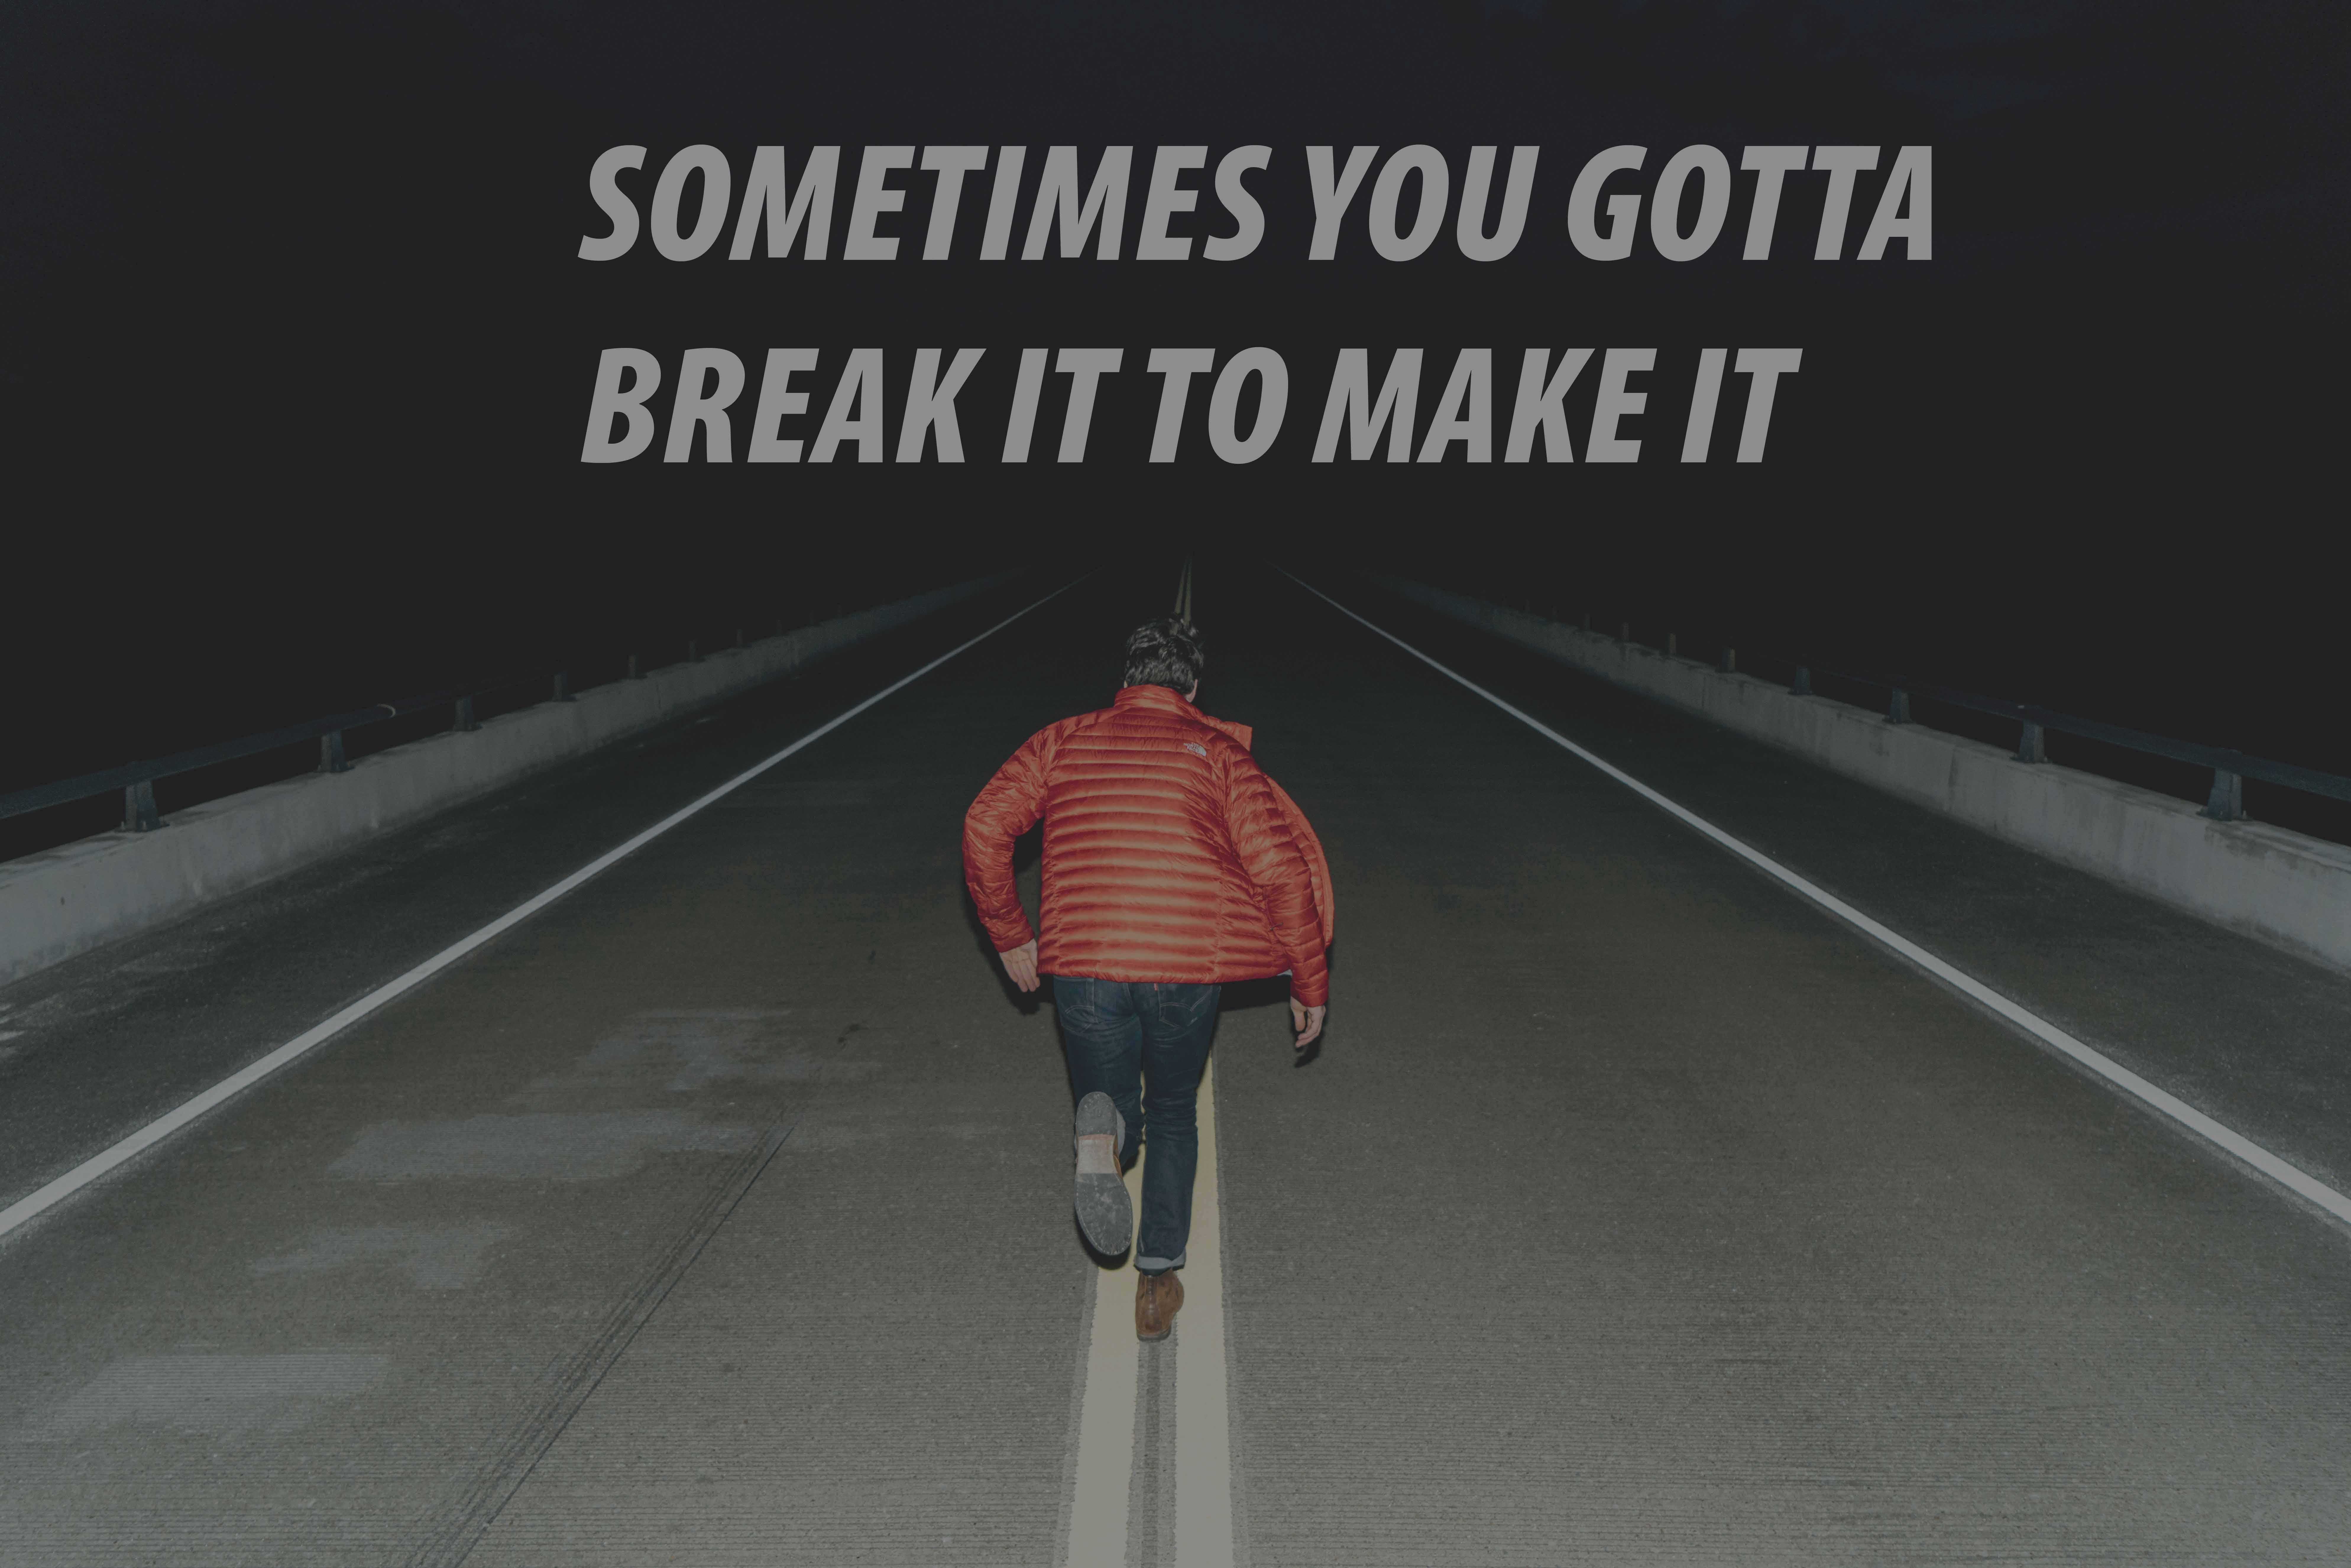 SOMETIMES YOU GOTTA BREAK IT TO MAKE IT